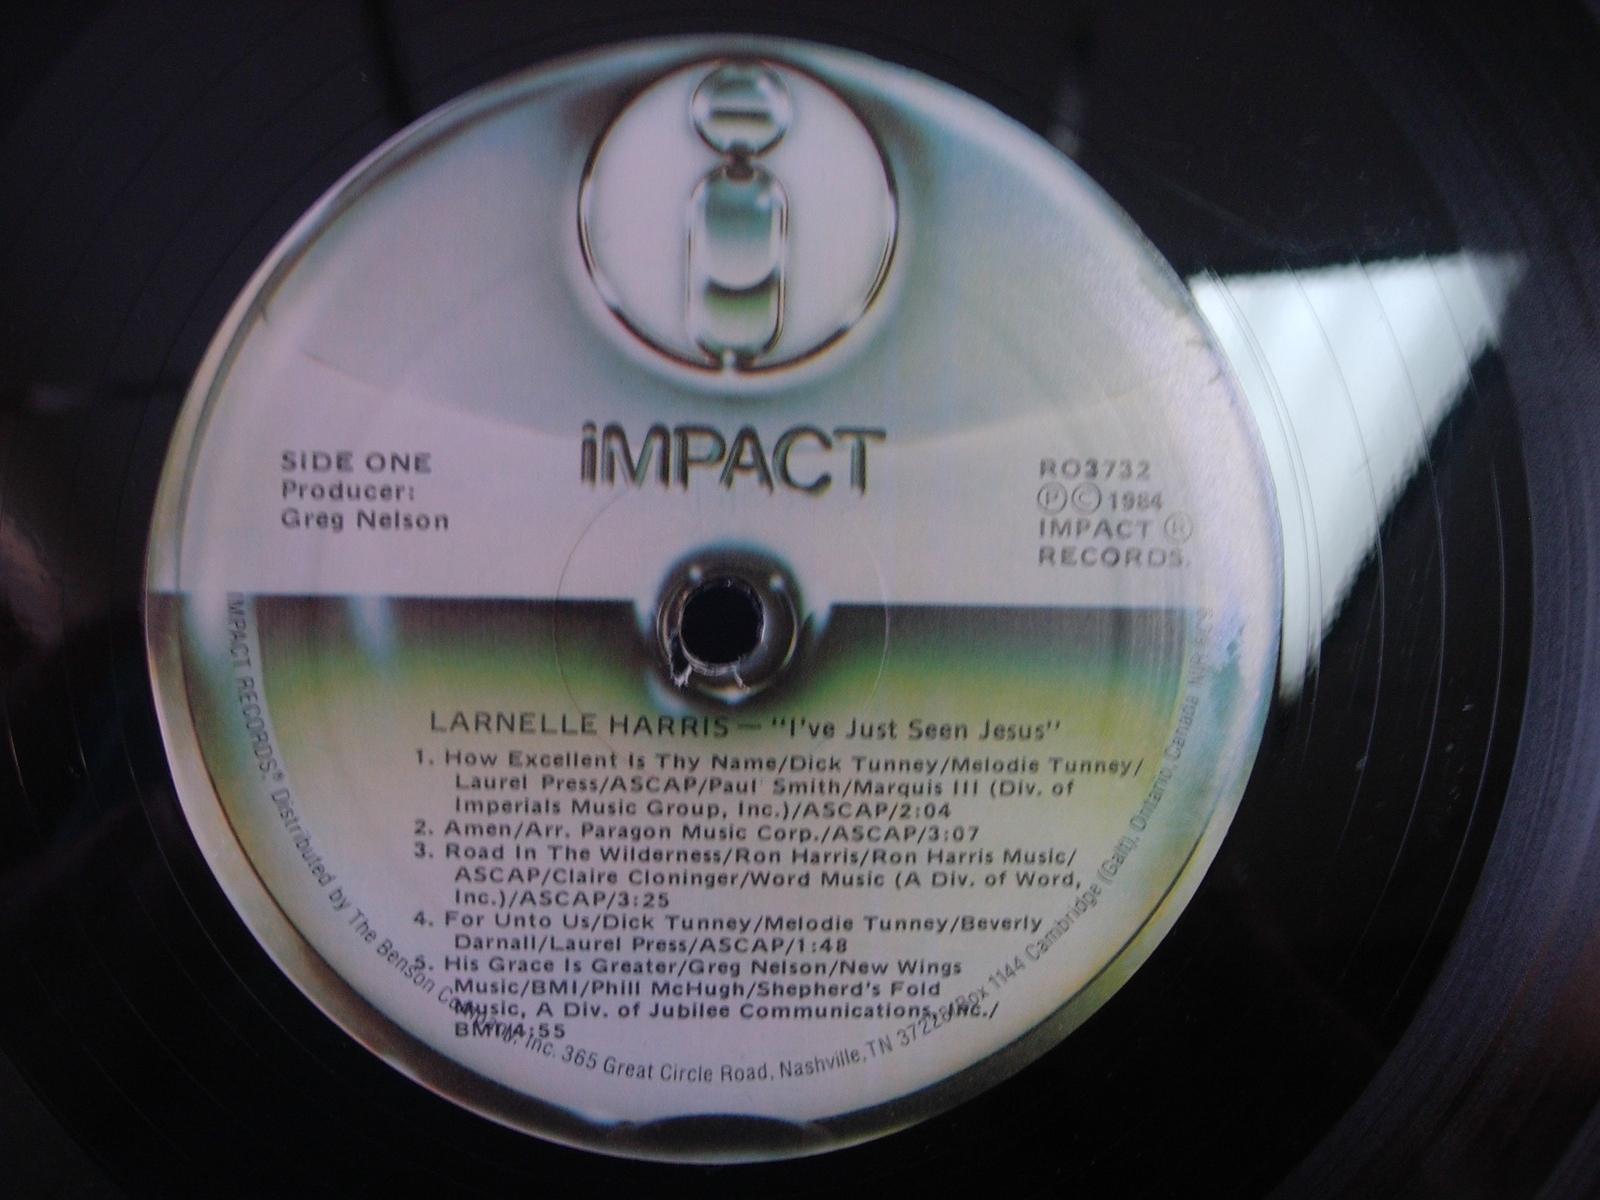 Larnelle Harris - I've Just Seen Jesus - Impact Records RO 3732